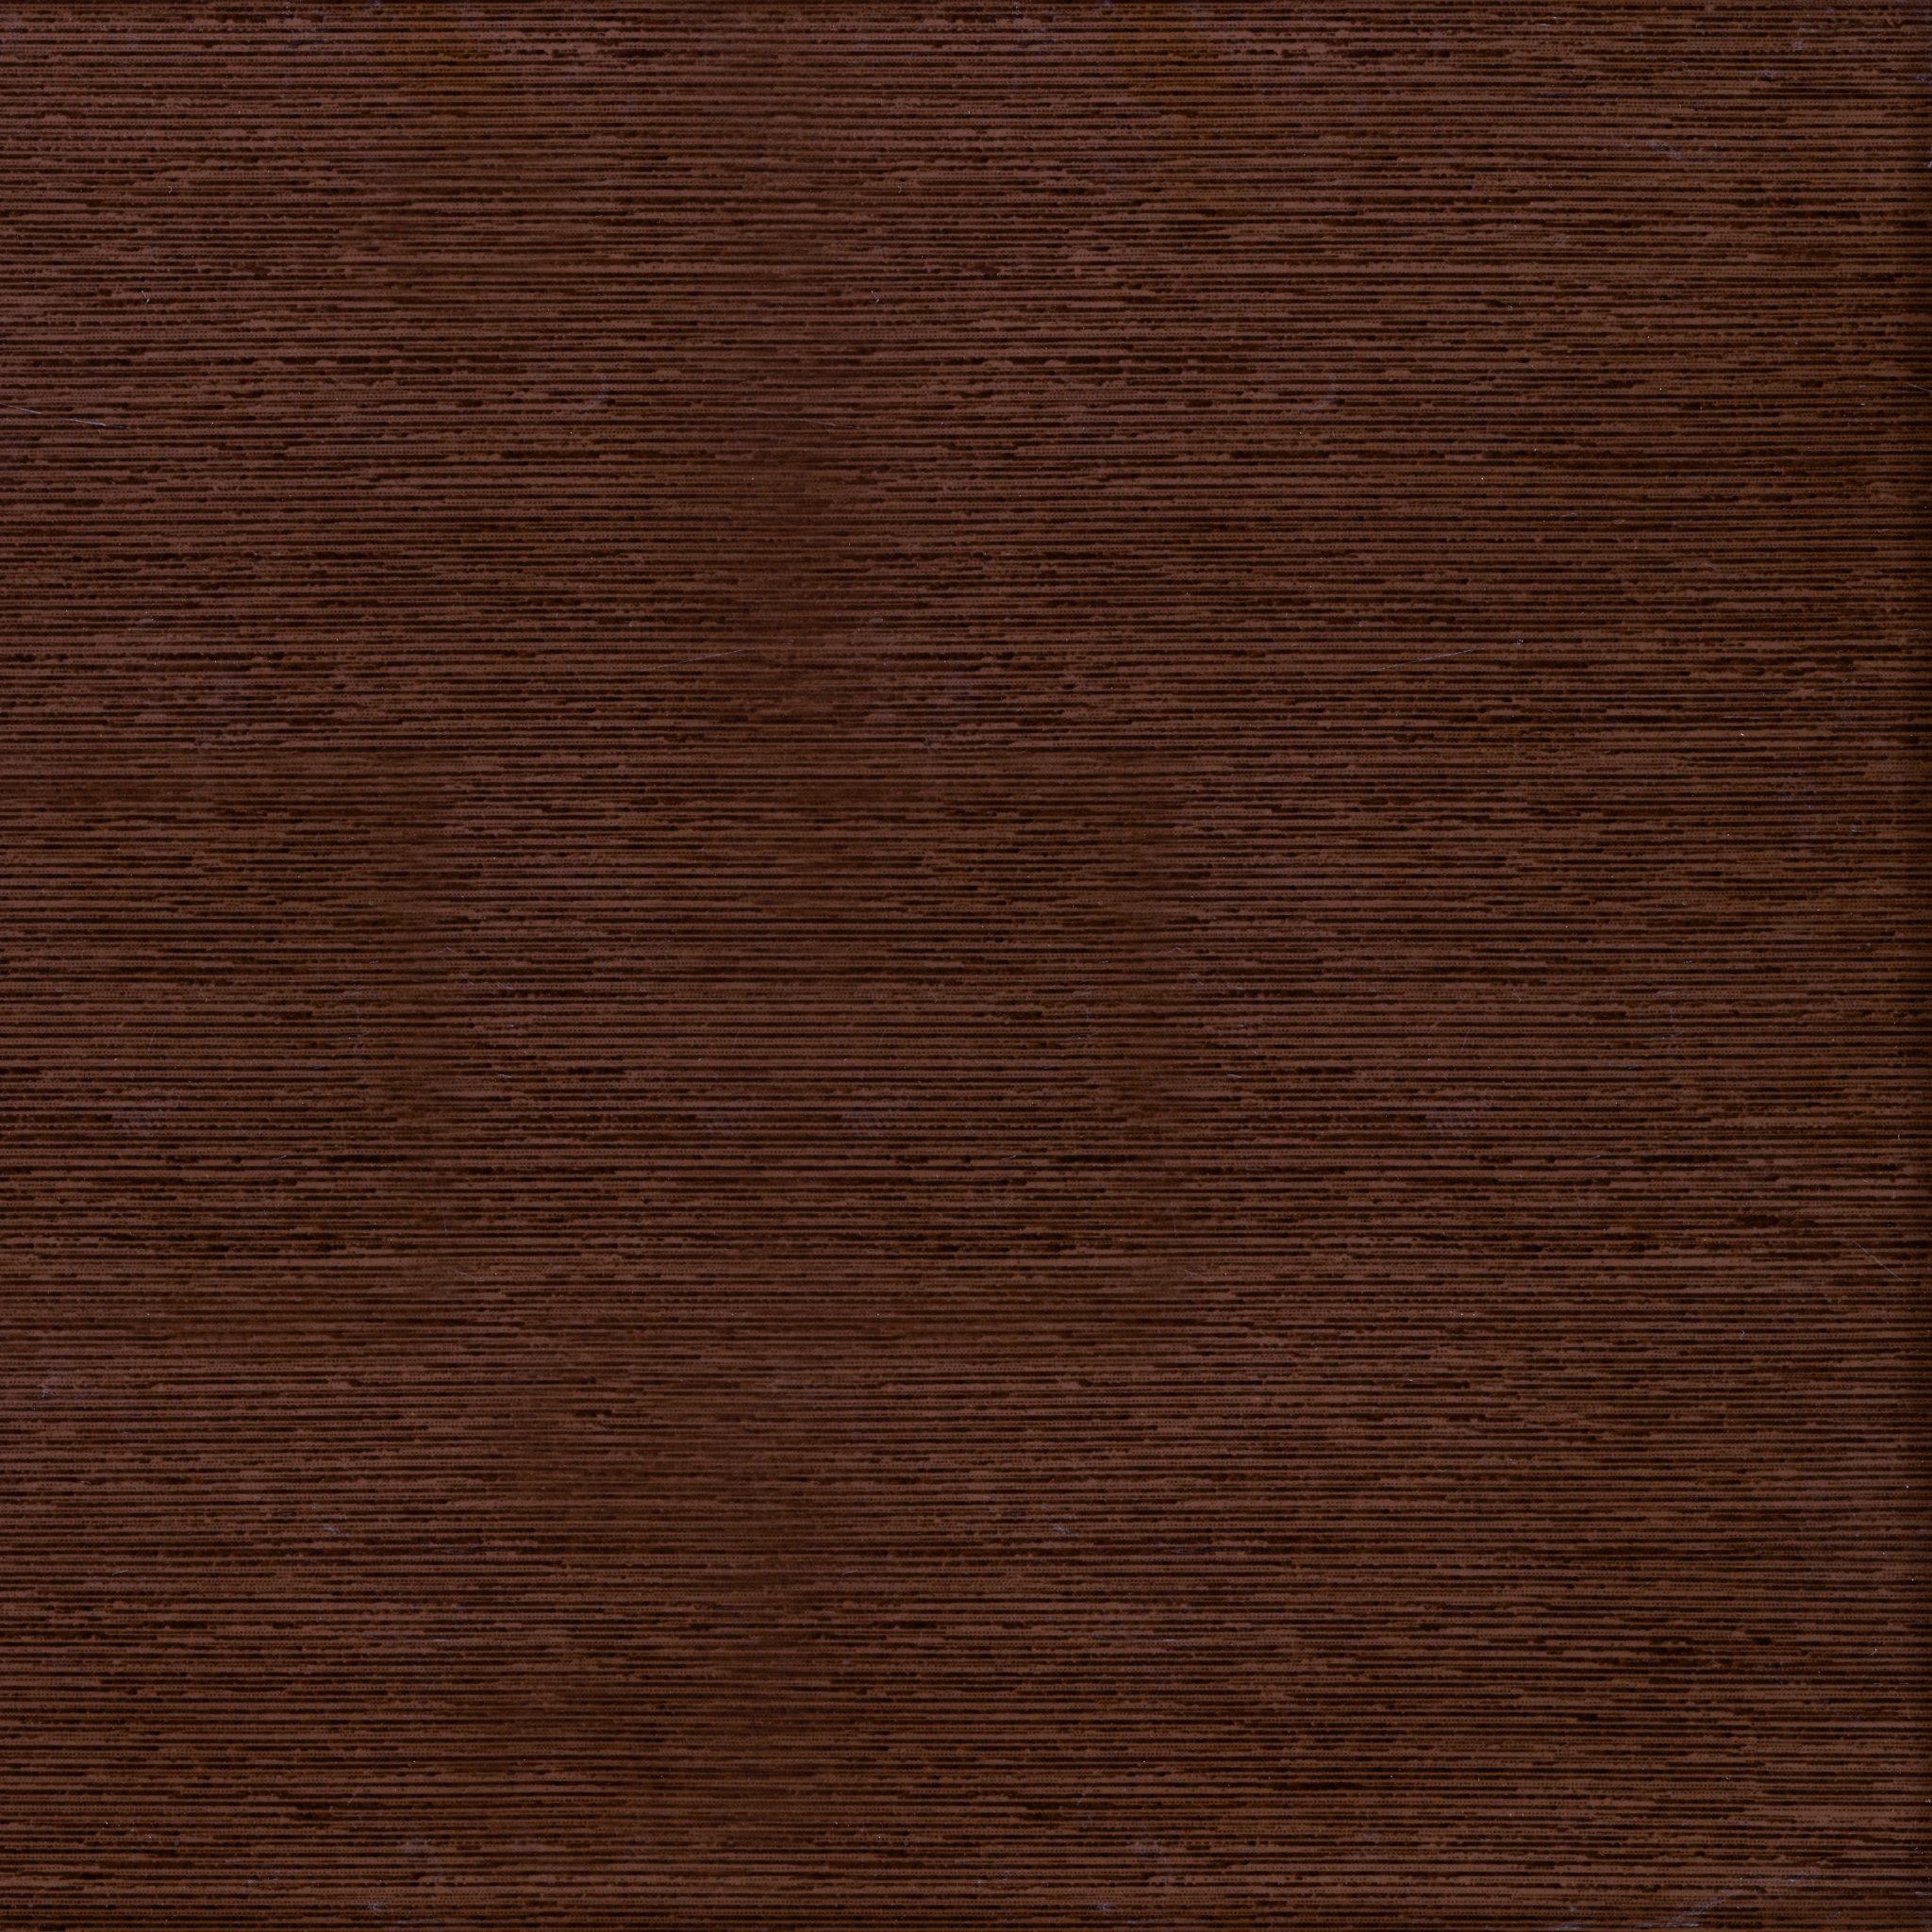 Laura напольная плитка (шоколад), 30х30